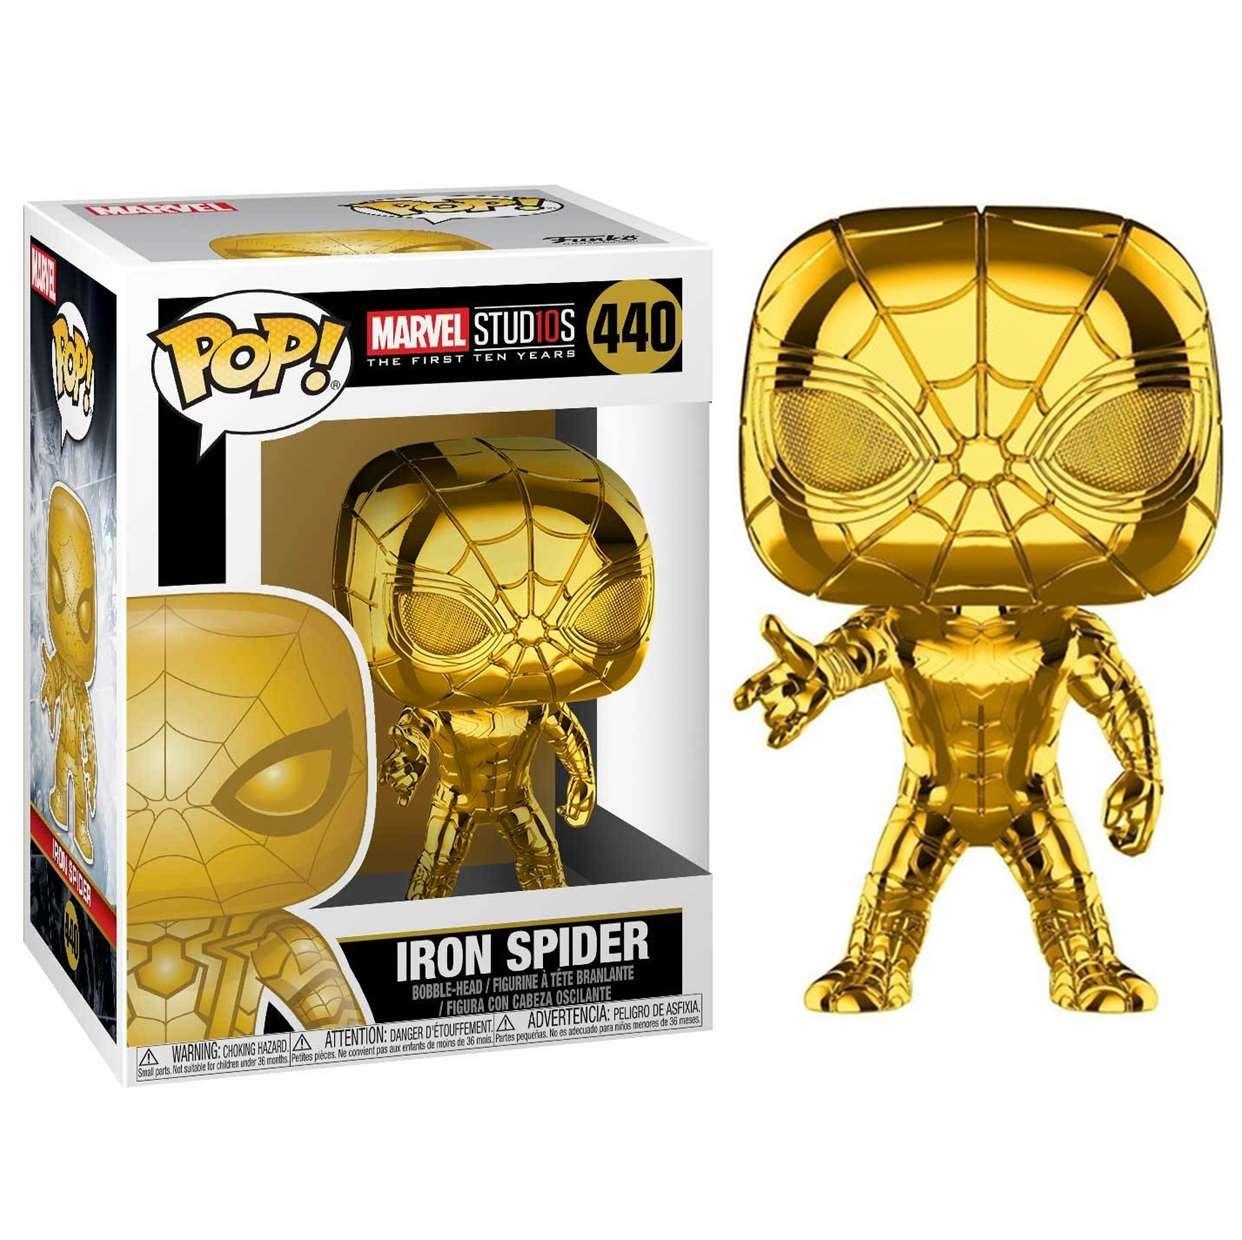 Iron Spider #440 Figura Marvel Studios 10th Funko Pop!